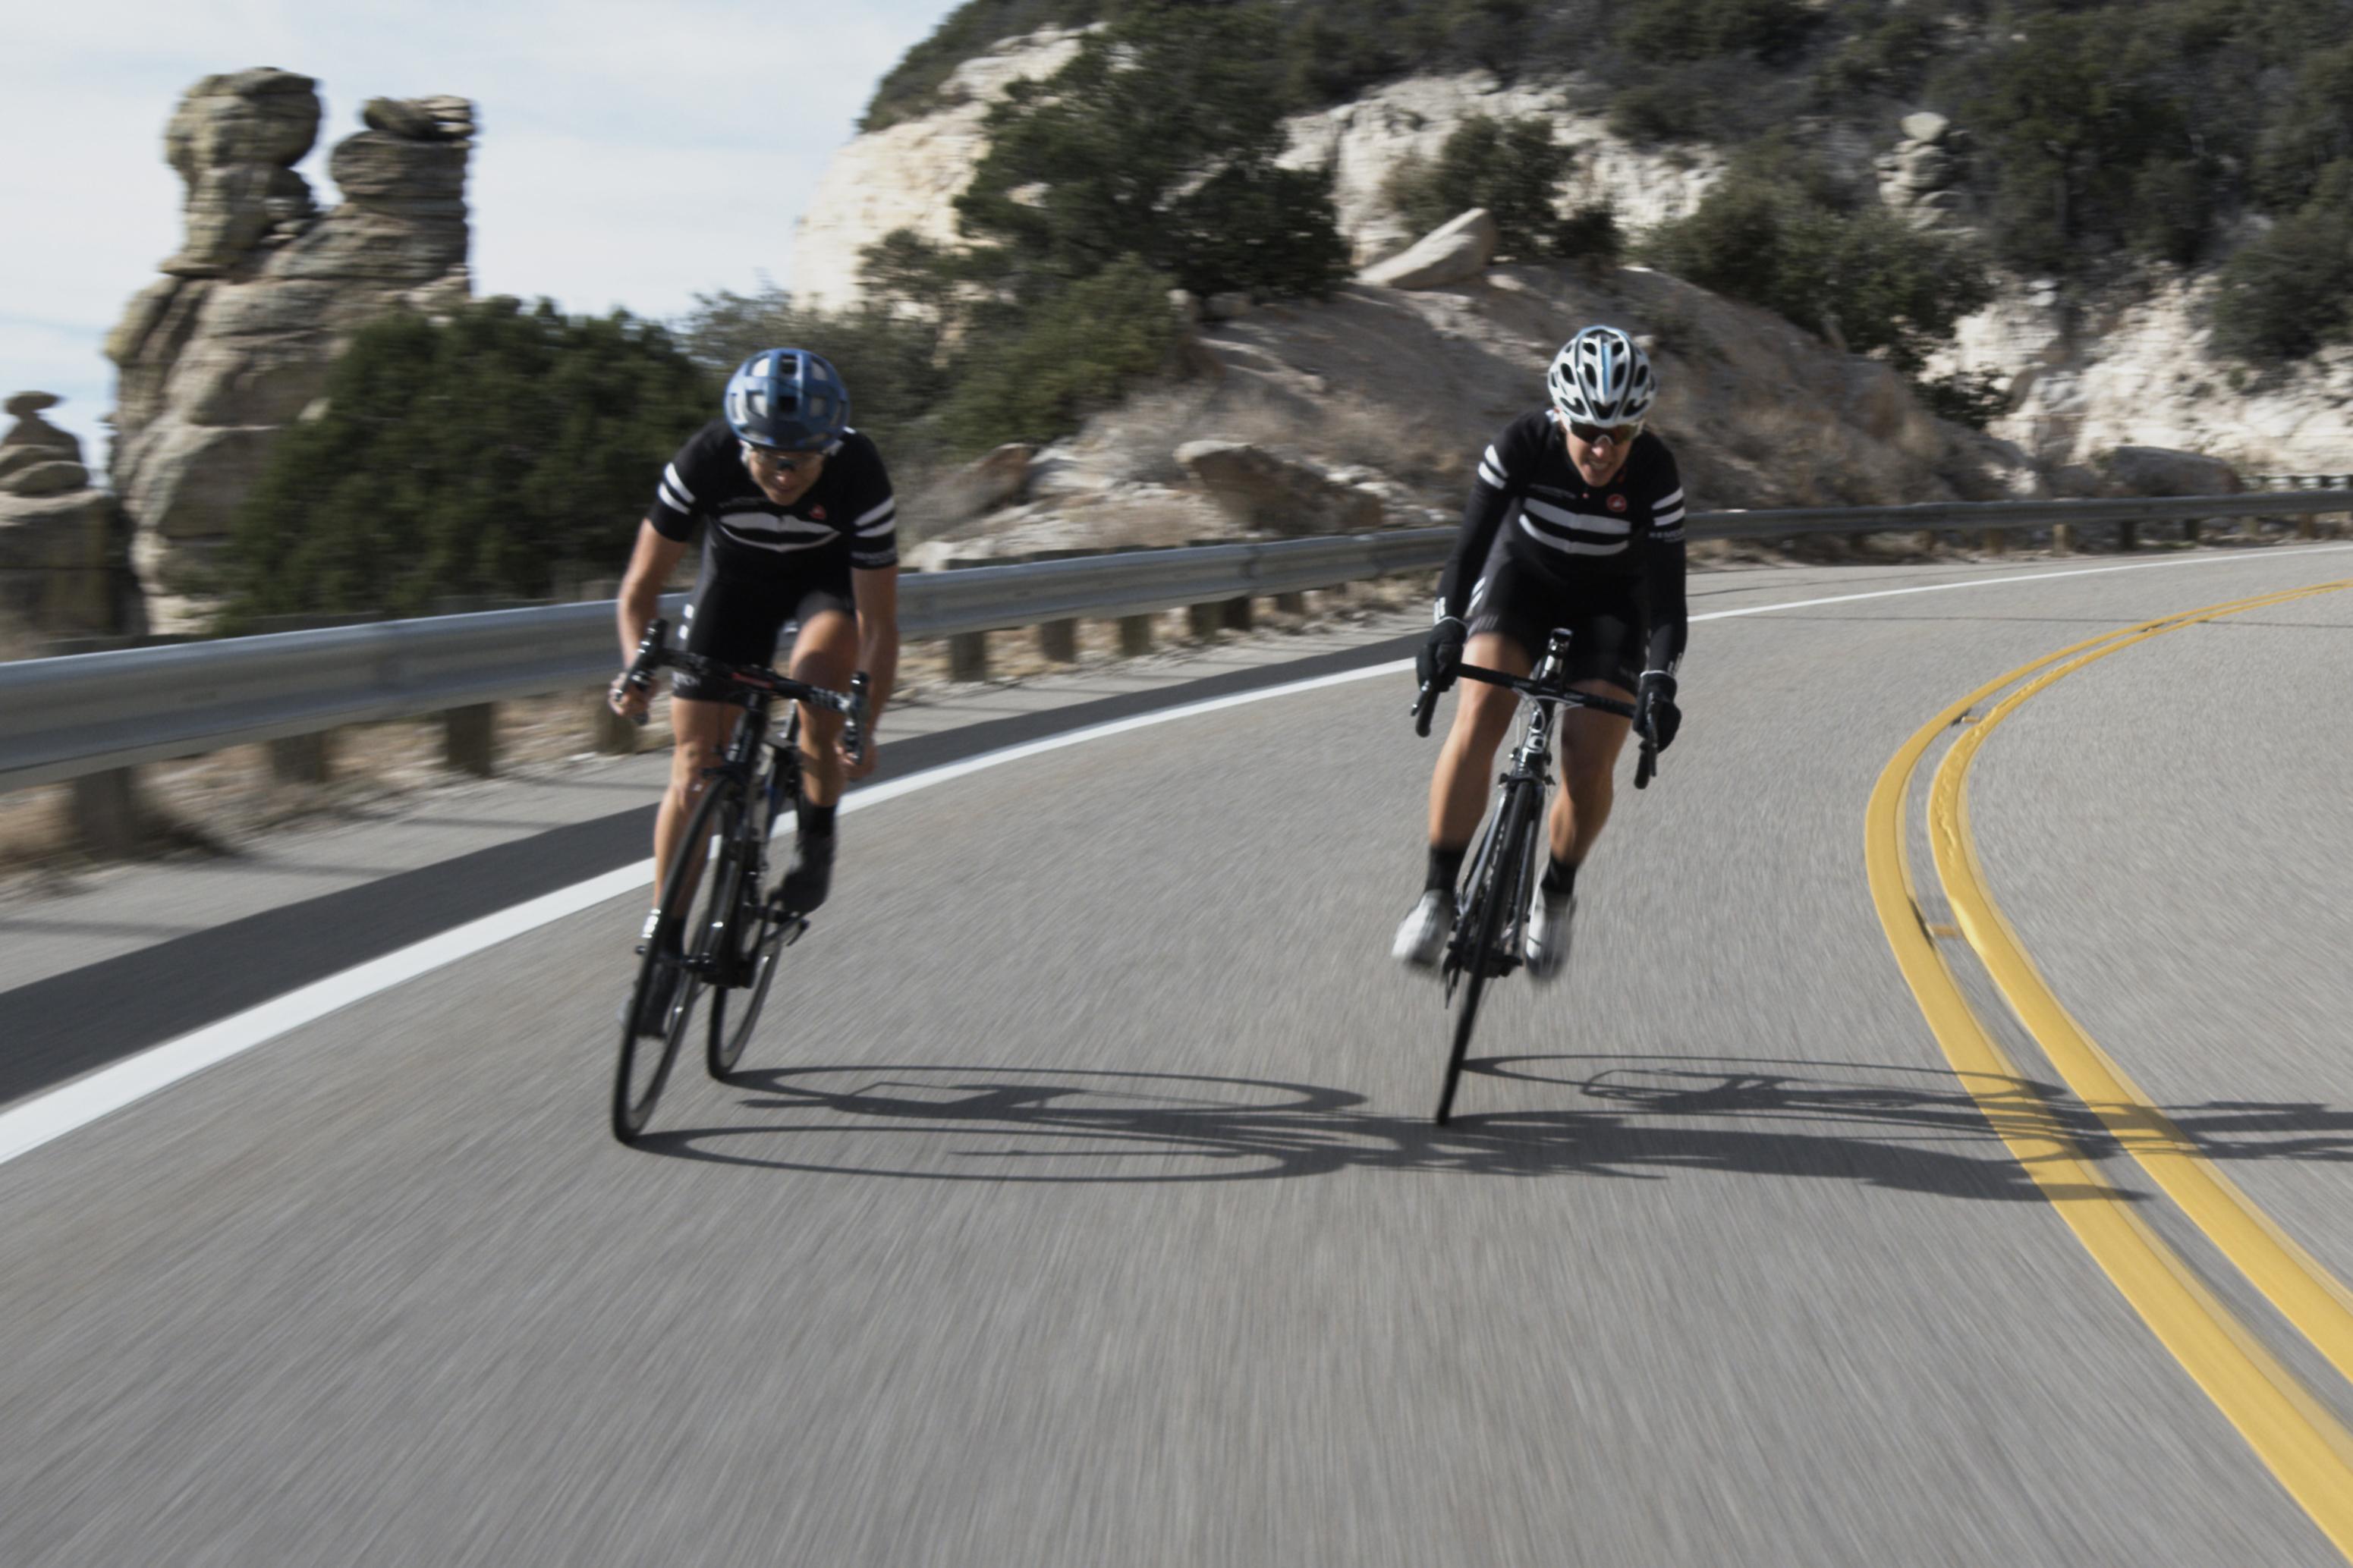 Kathryn Bertine cycling